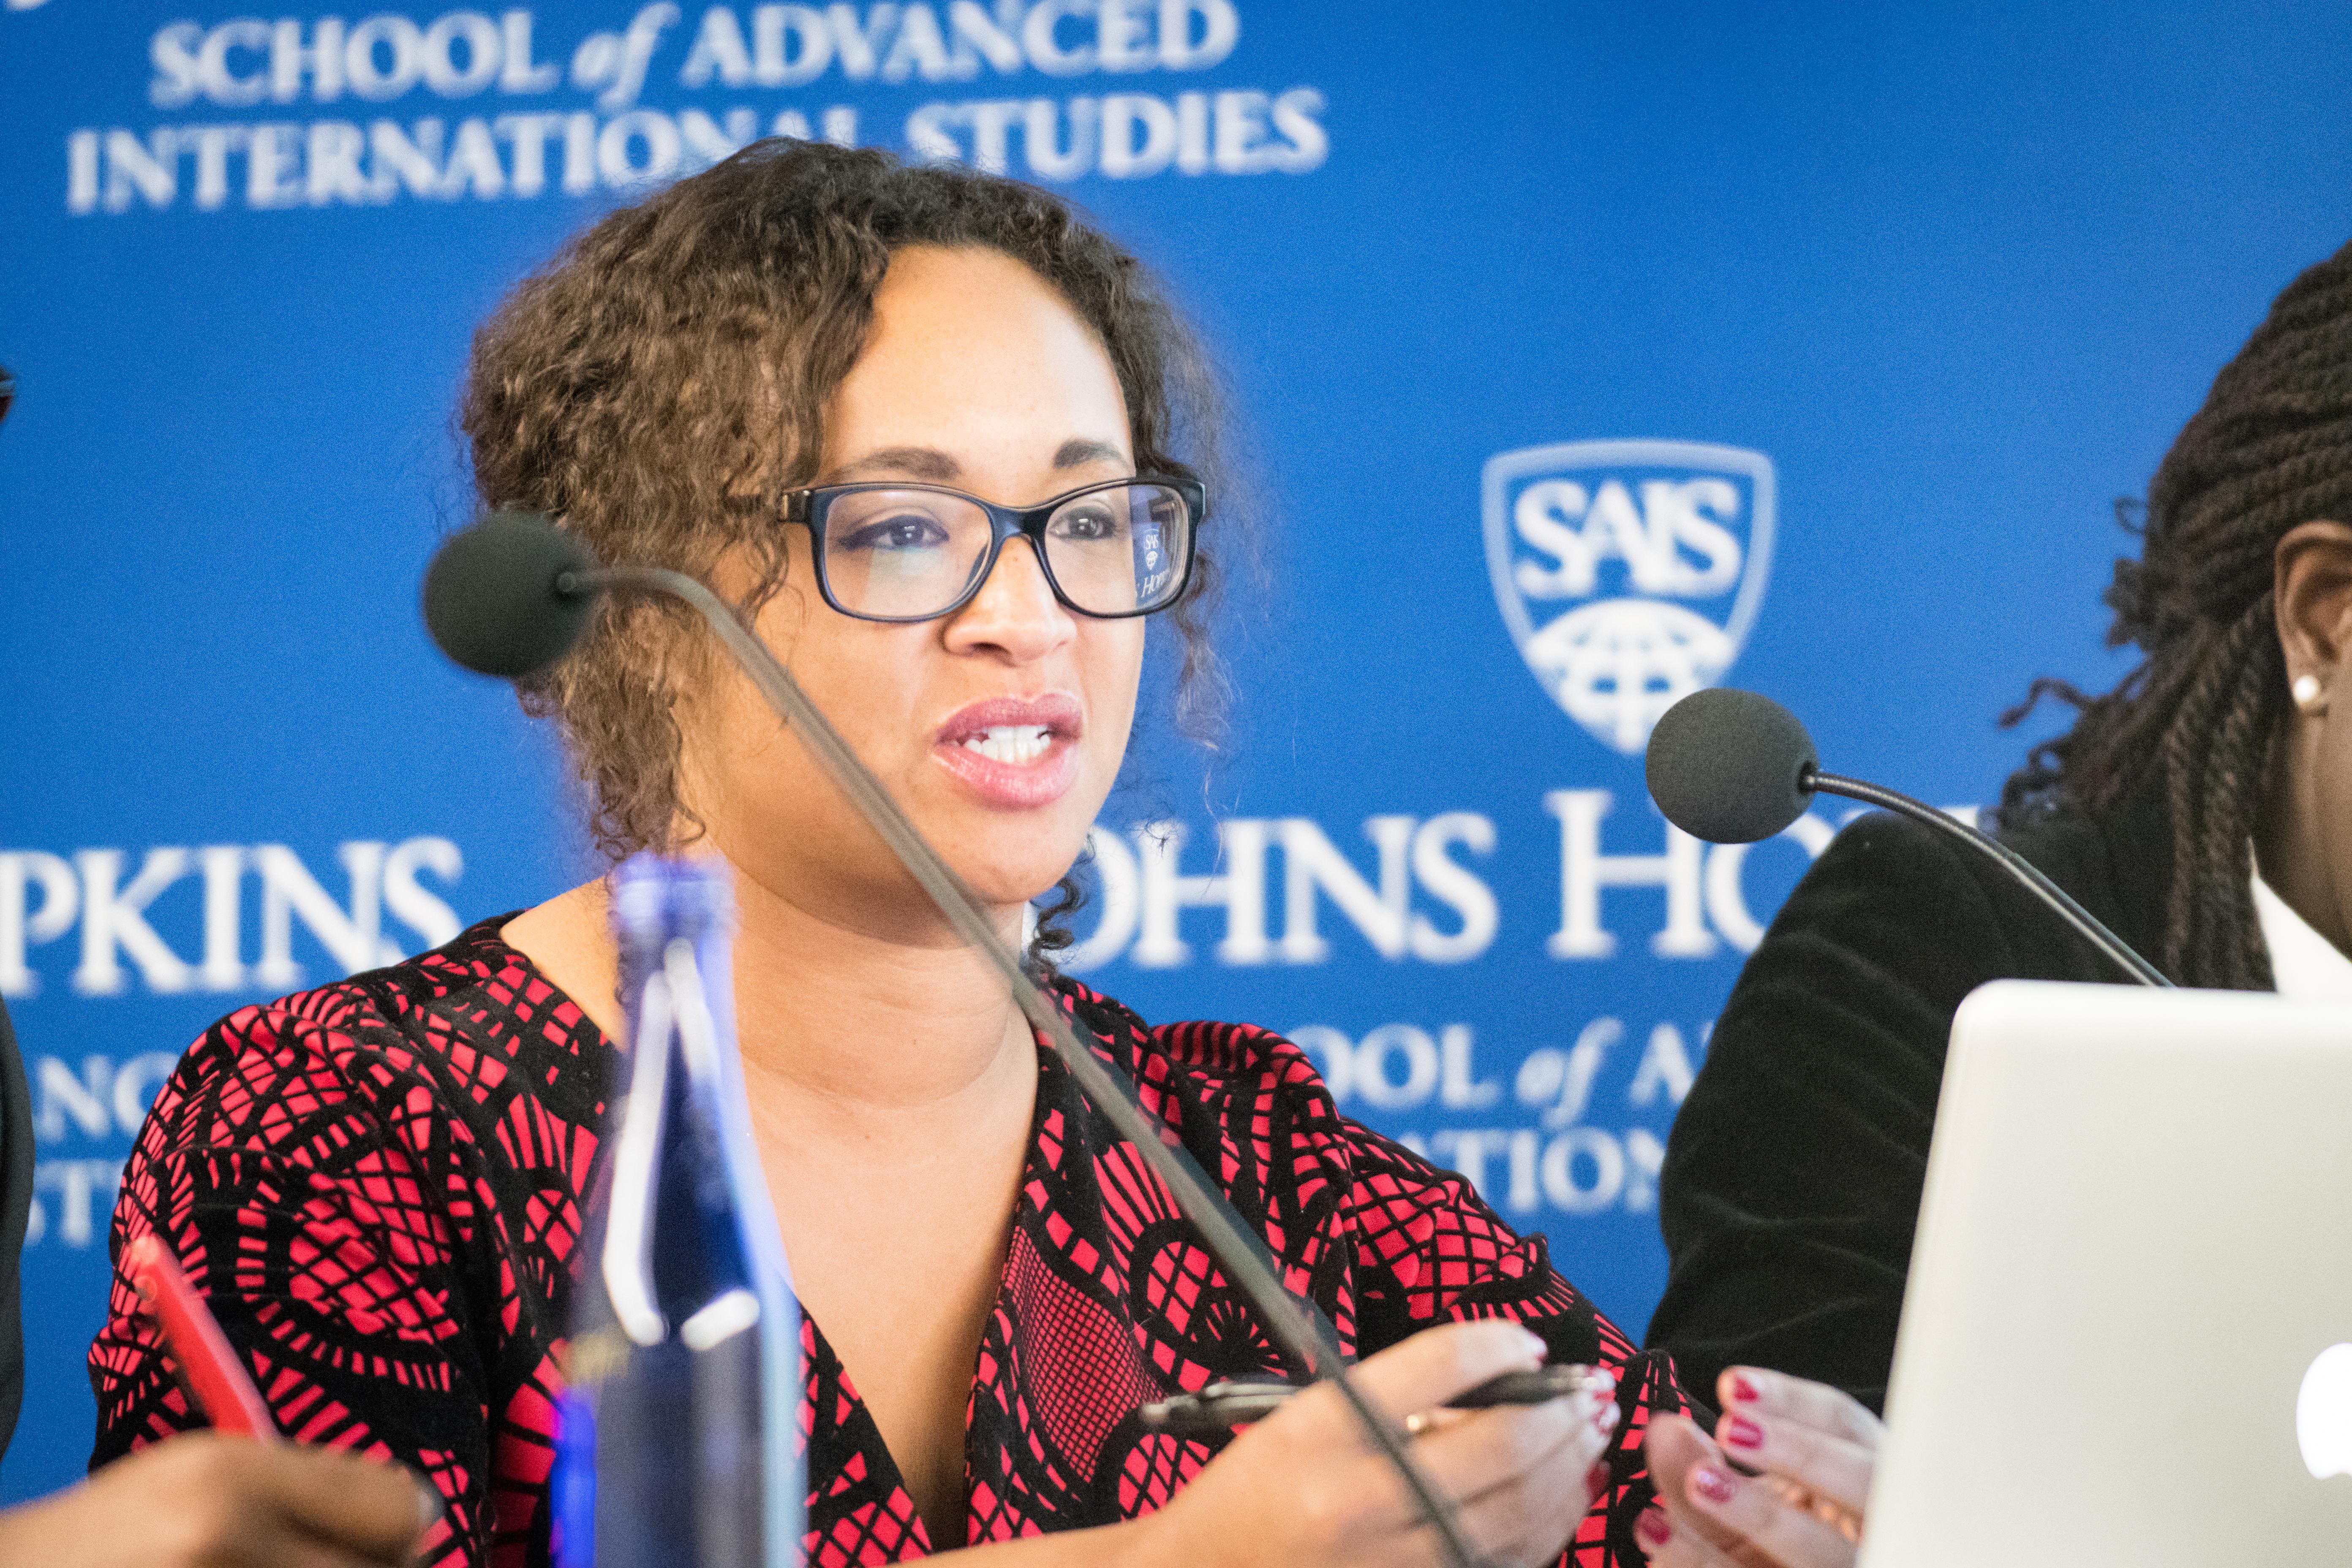 Johns Hopkins SAIS student